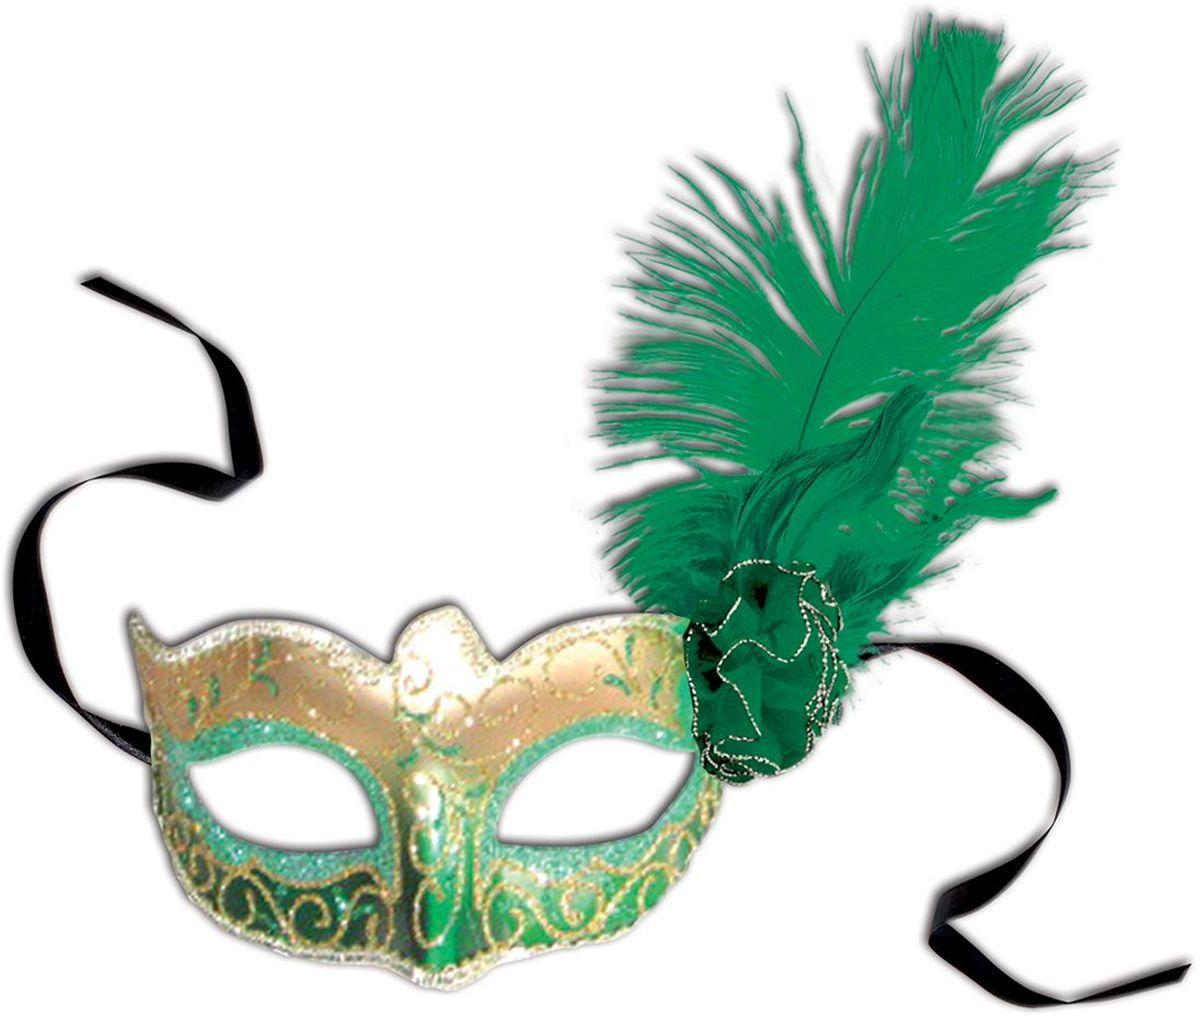 Partymania Венецианская маска Карнавал T1217 цвет зелено-золотая